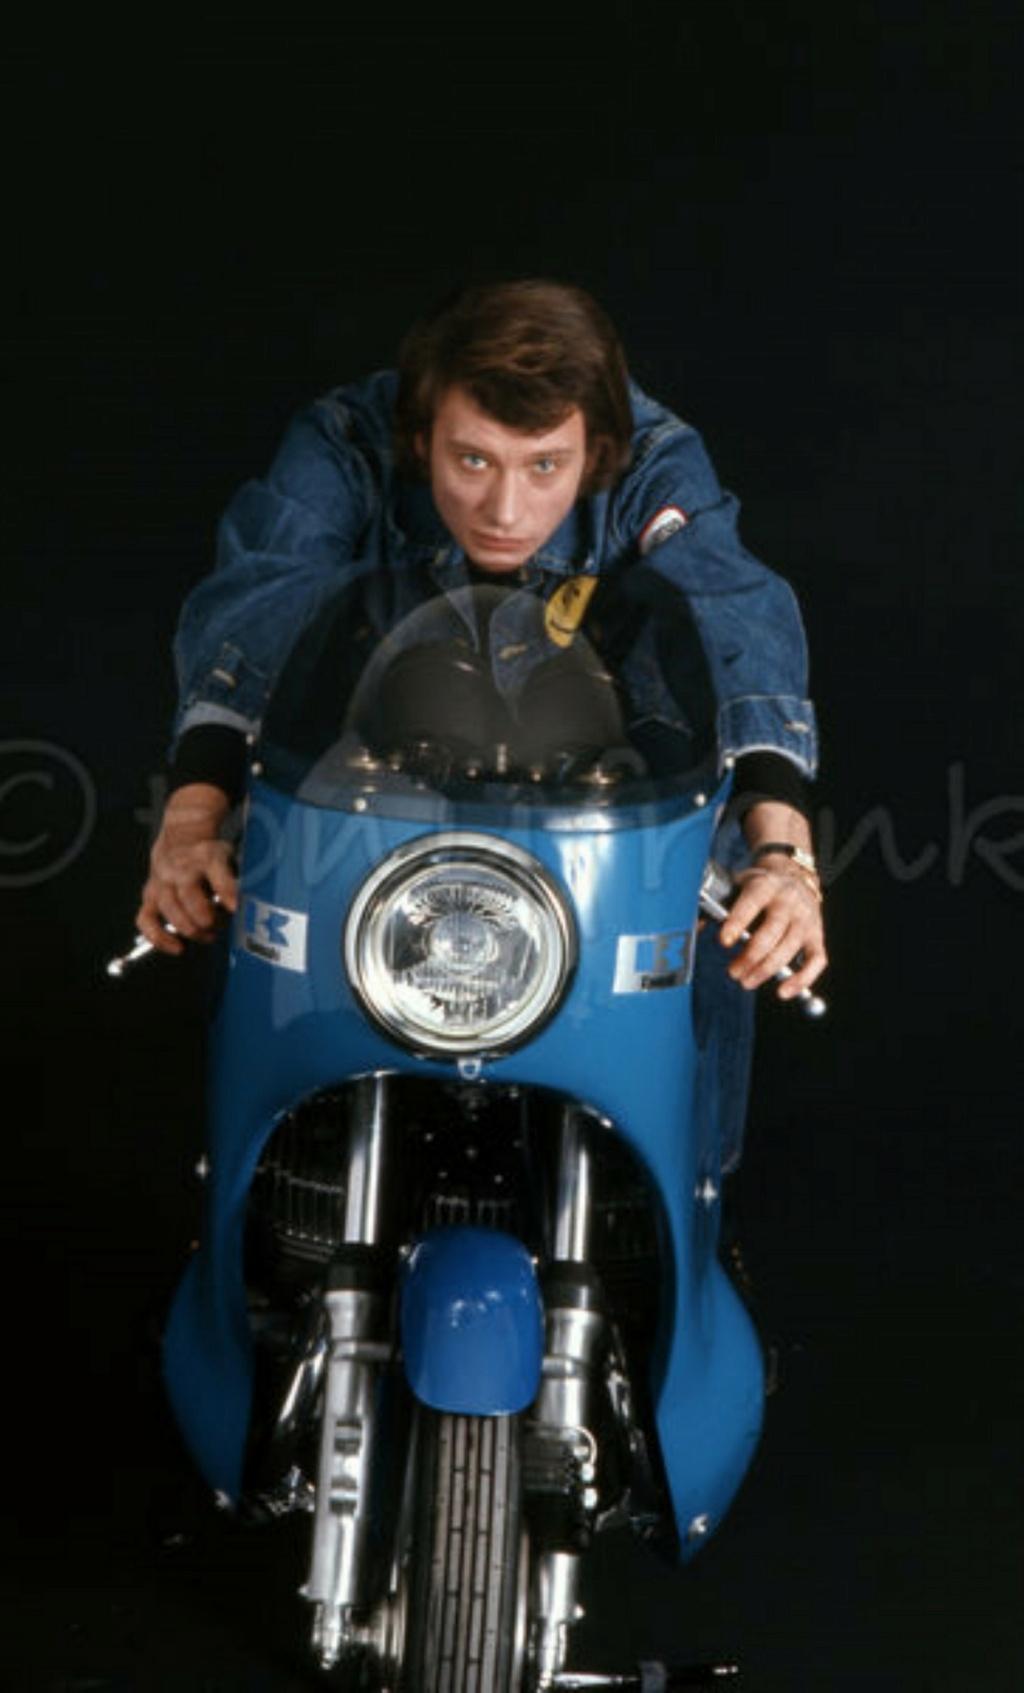 KAWASAKI 750 H2 MATCH IV DE JOHNNY HALLYDAY ( 1972 ) Pict_m30